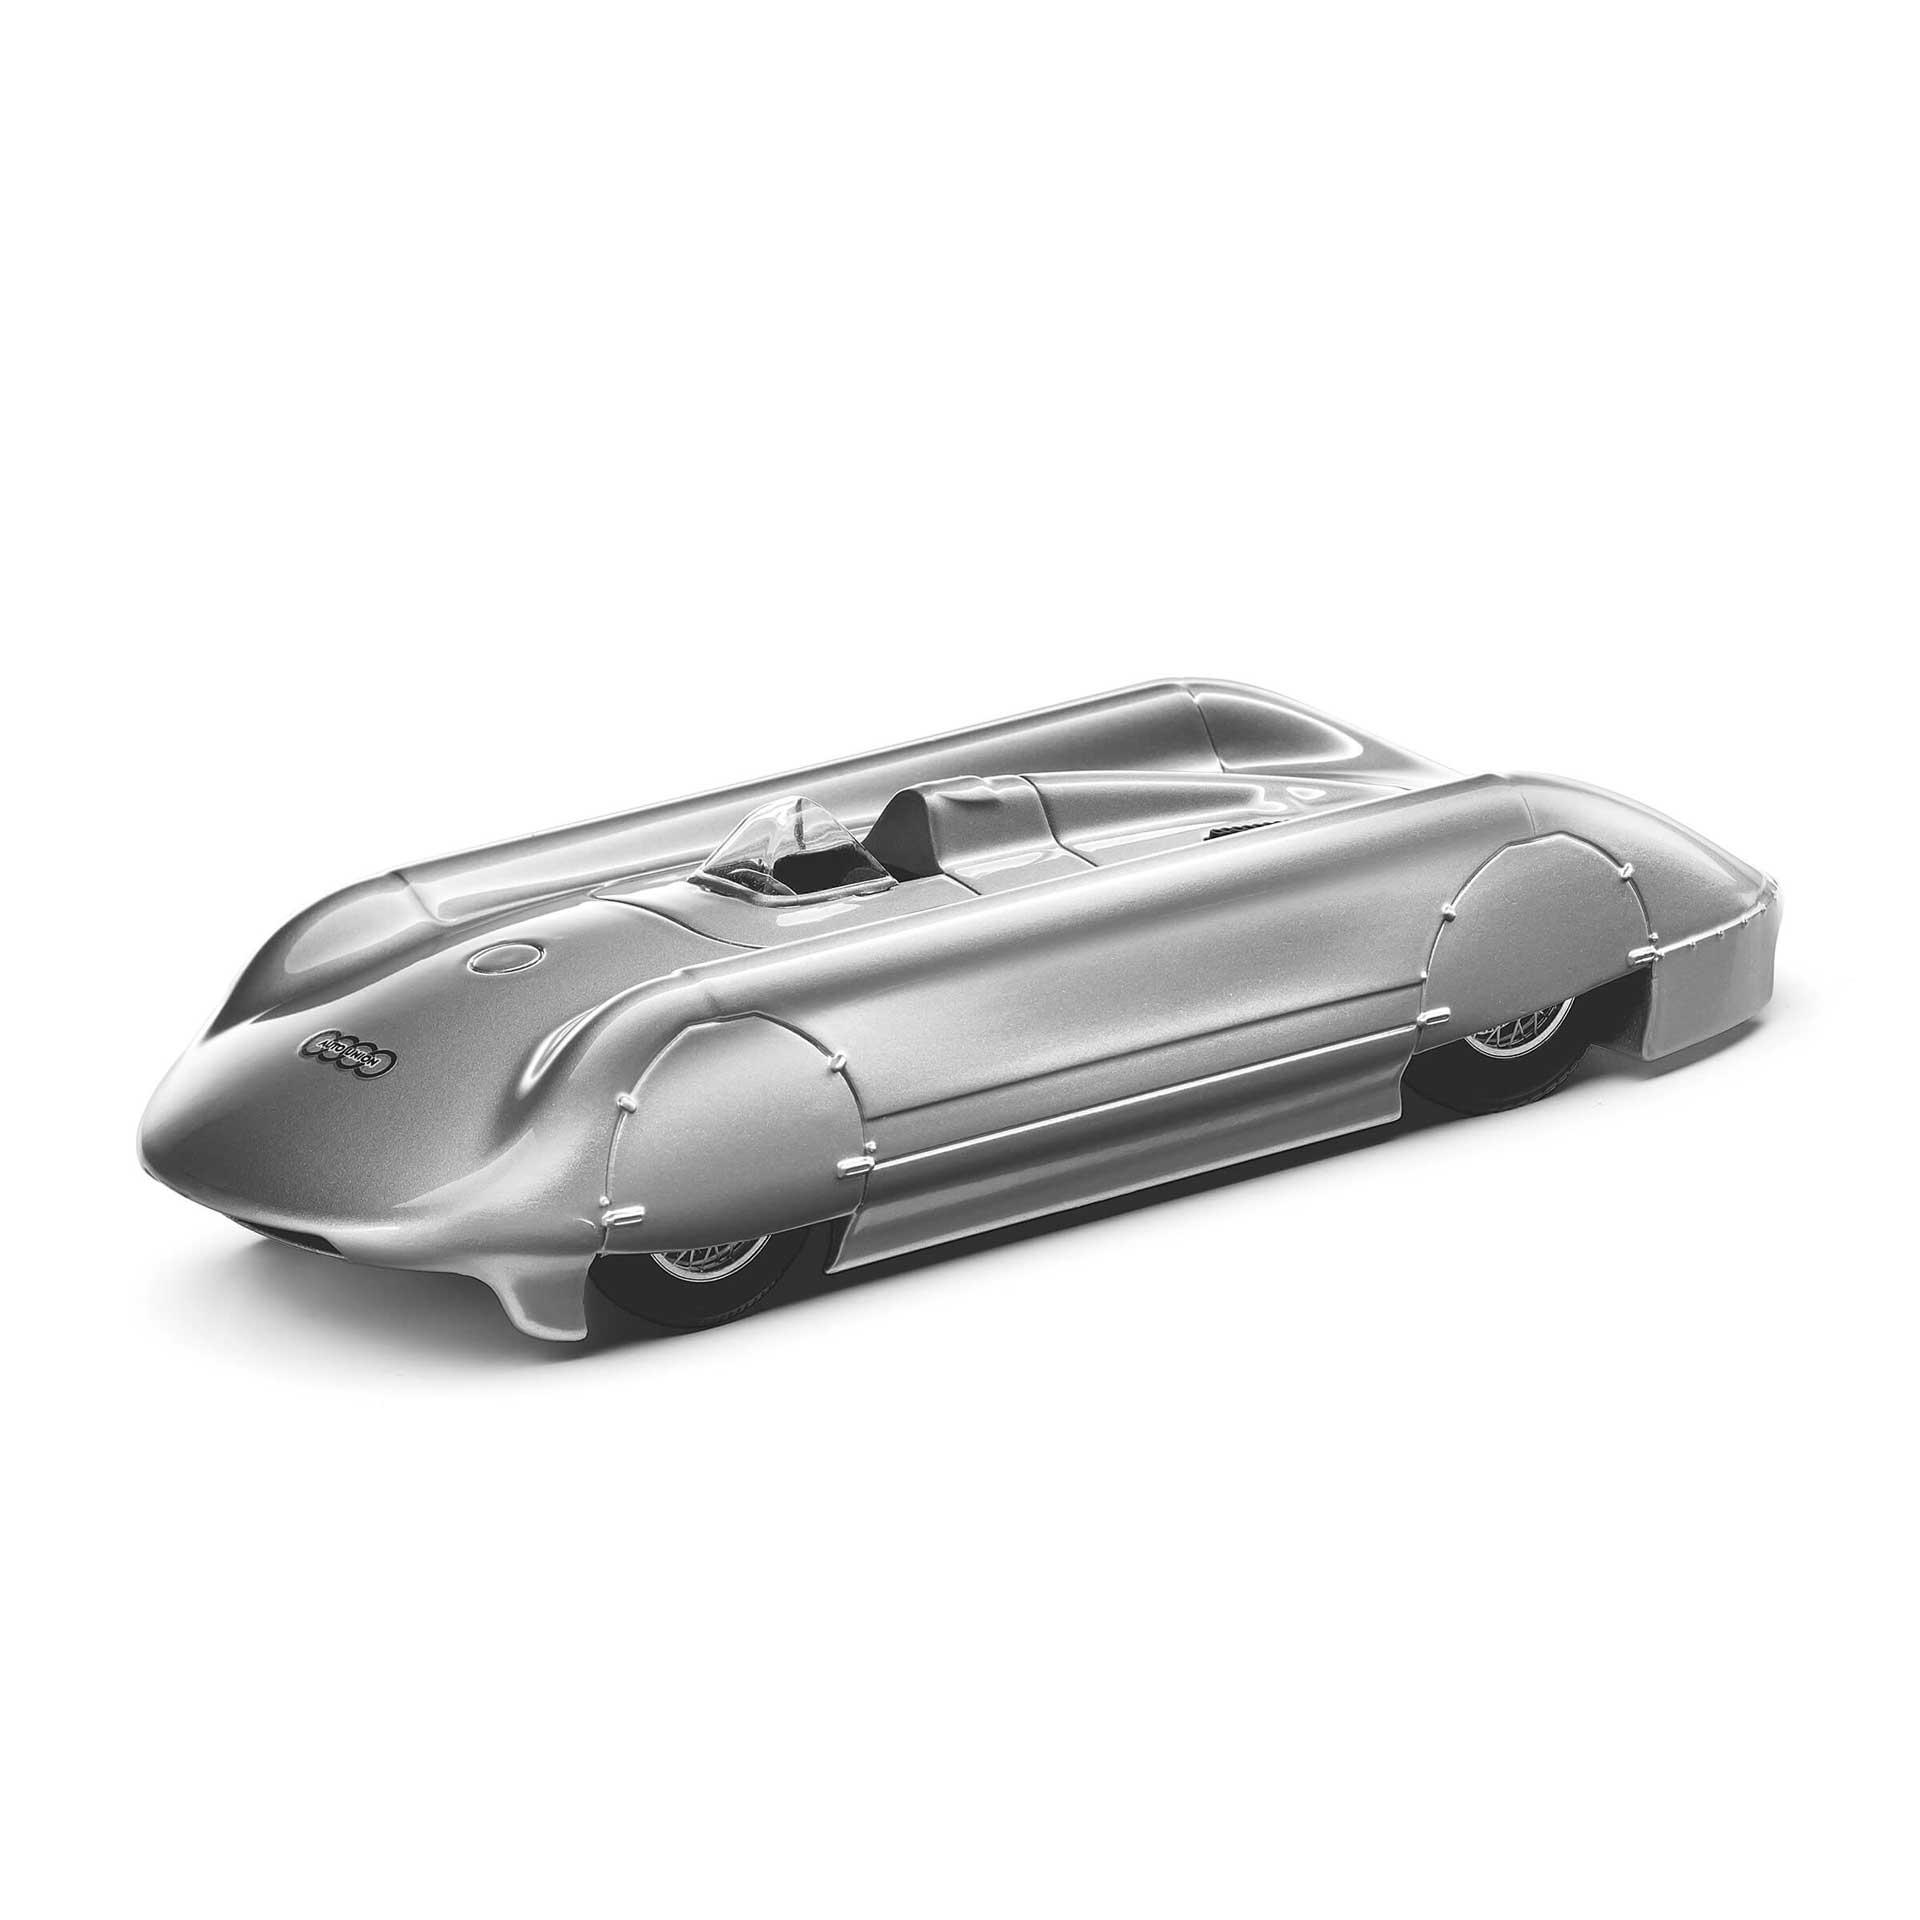 Audi heritage Auto Union Stromline Rekordwagen Modellauto 1:43